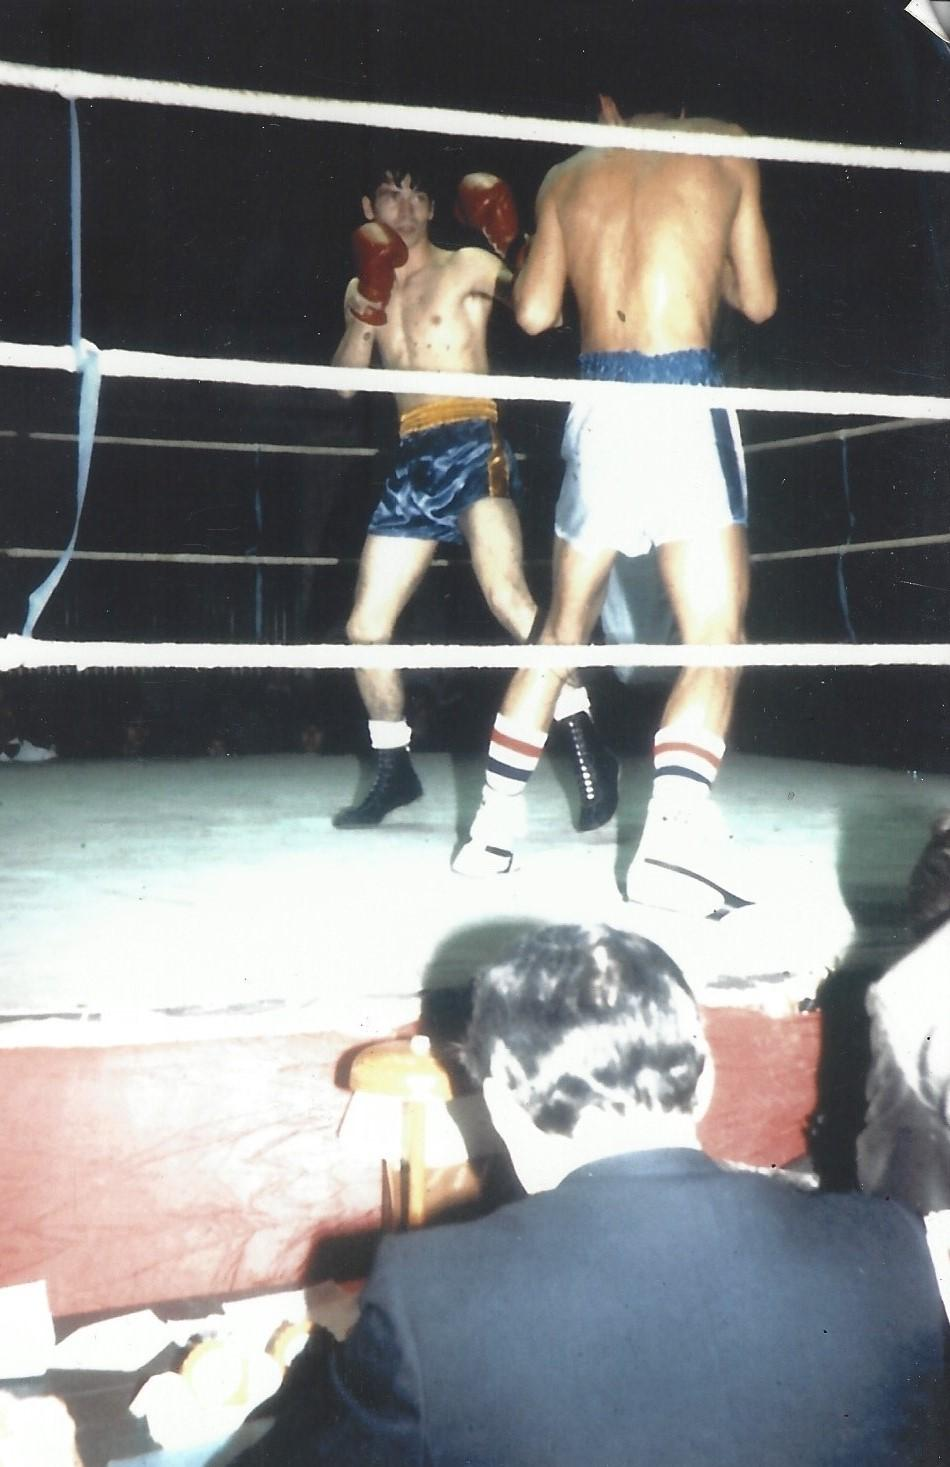 COMBAT BOXE ANGLAISE: Championnat d'Auvergne 1982 (Gagne KO 1 er round)